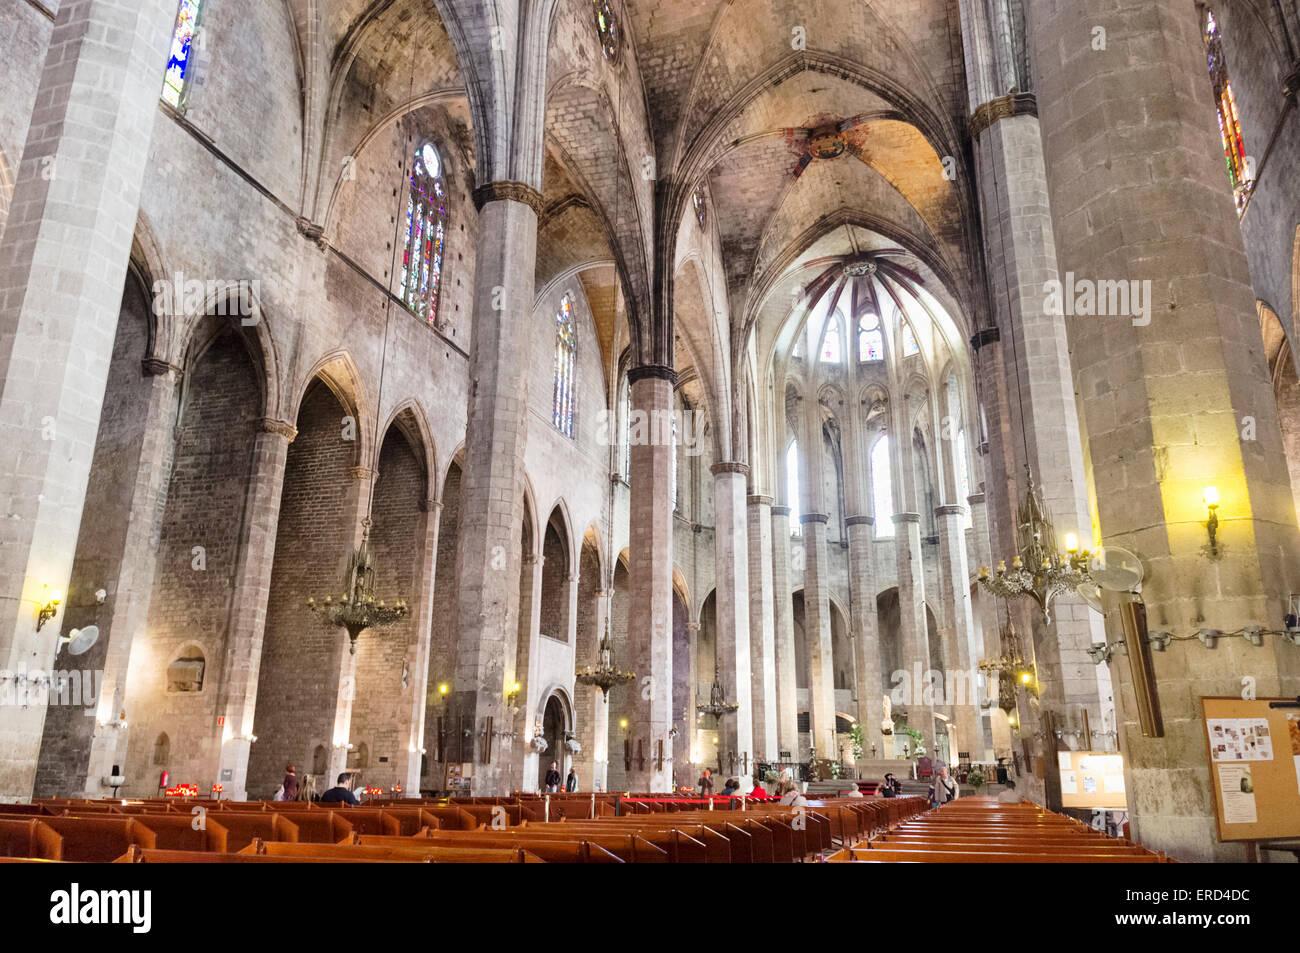 Innere der Santa María del Mar Basilika in Barcelona, Katalonien, Spanien la Ribera geboren Stockbild